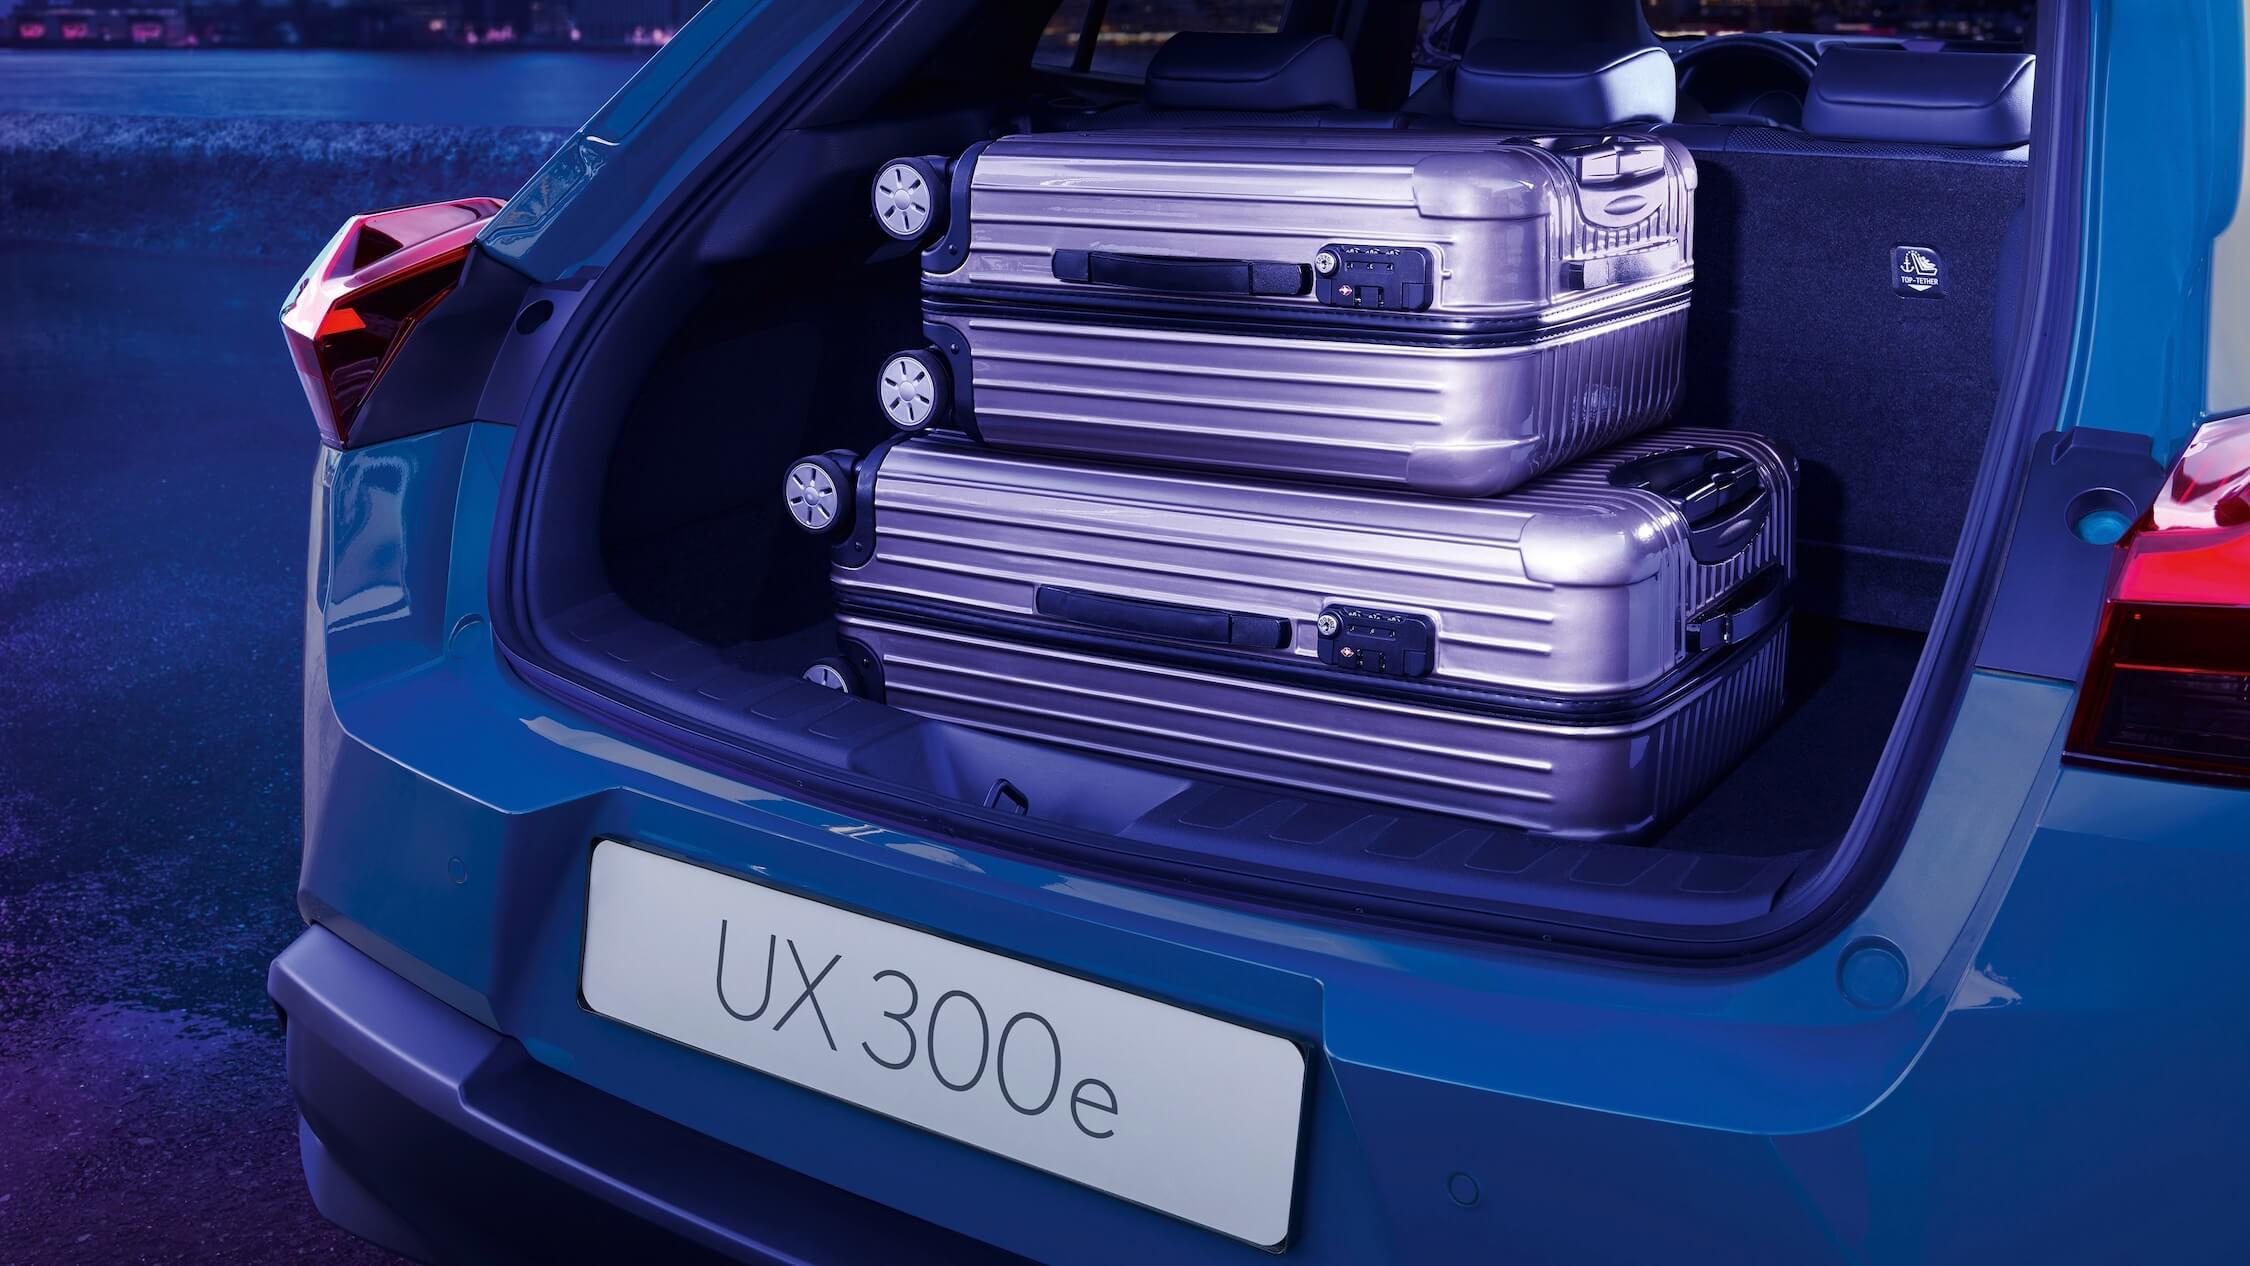 elektrische Lexus UX 300e koffer